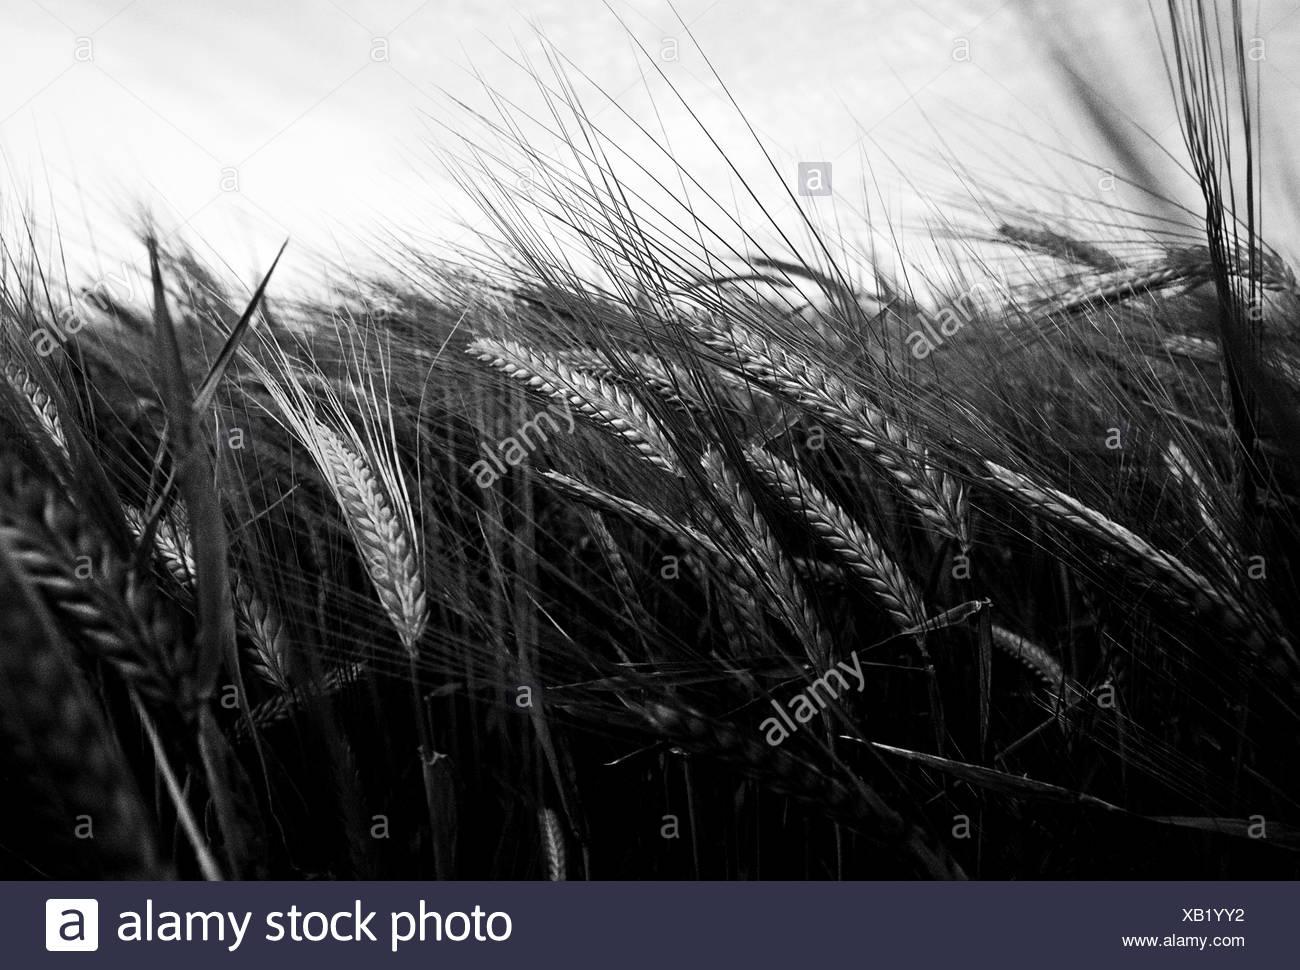 Close up of barley field - Stock Image